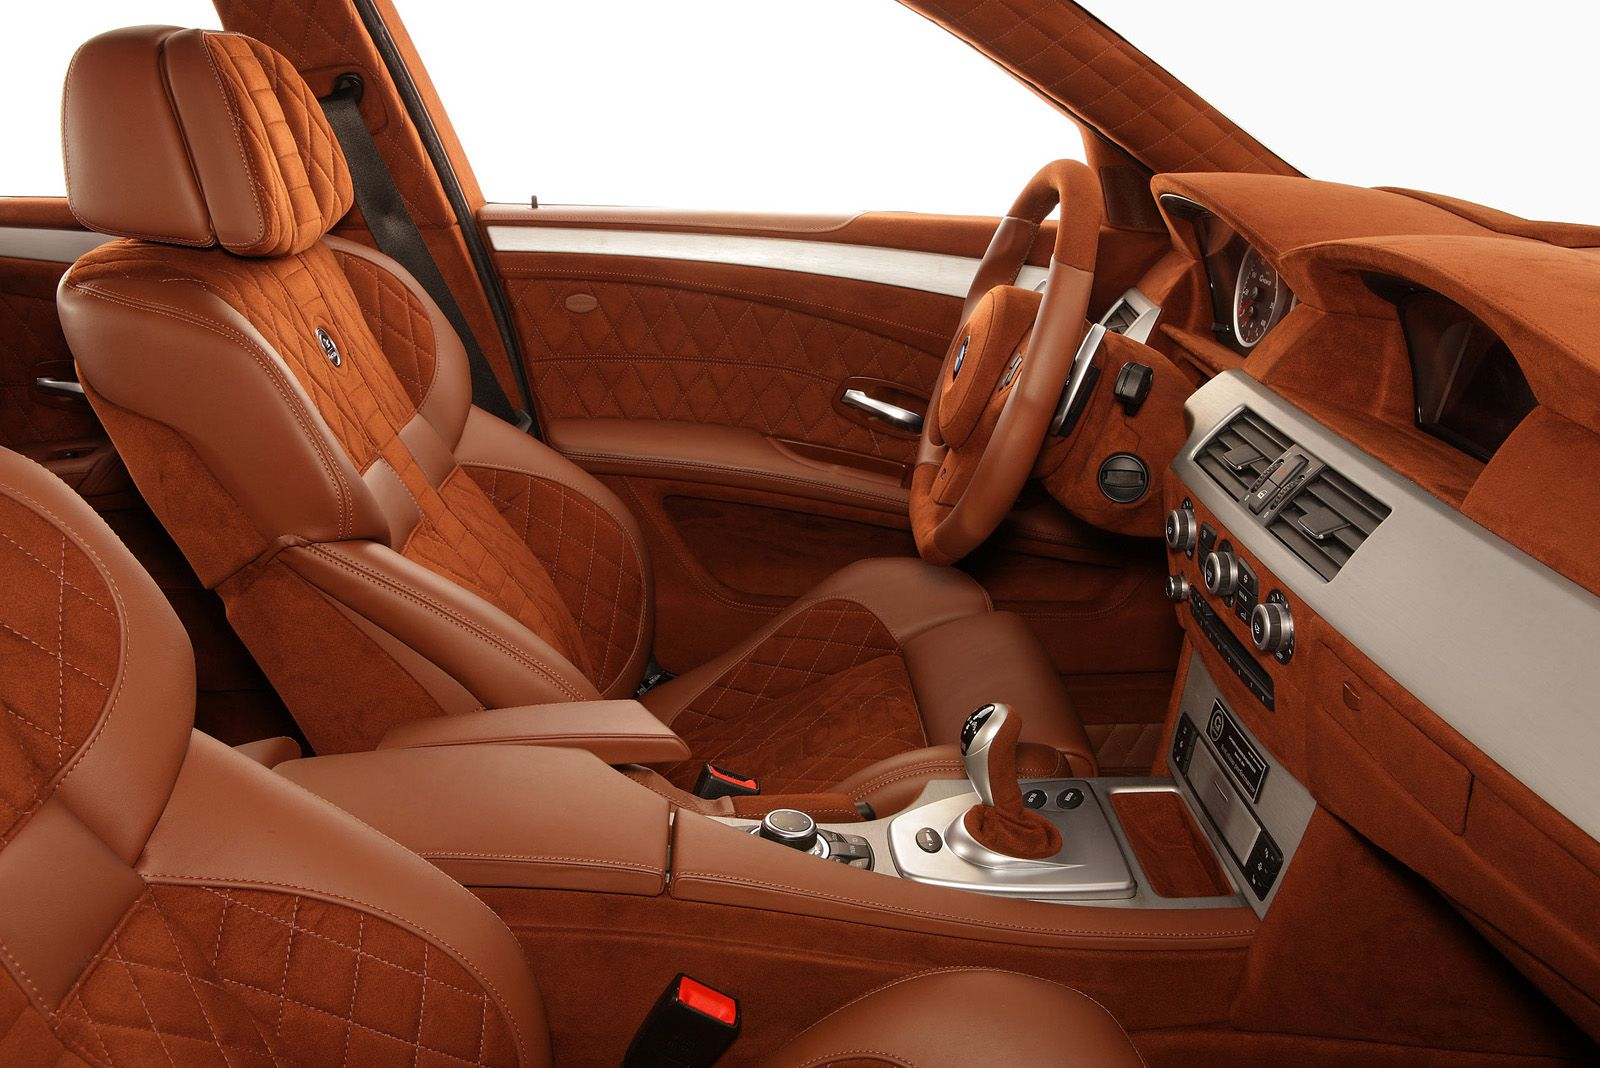 Car interior brown - New Custom Interior Car Designs With Custom Interior Car Design Sketch By Rykunov